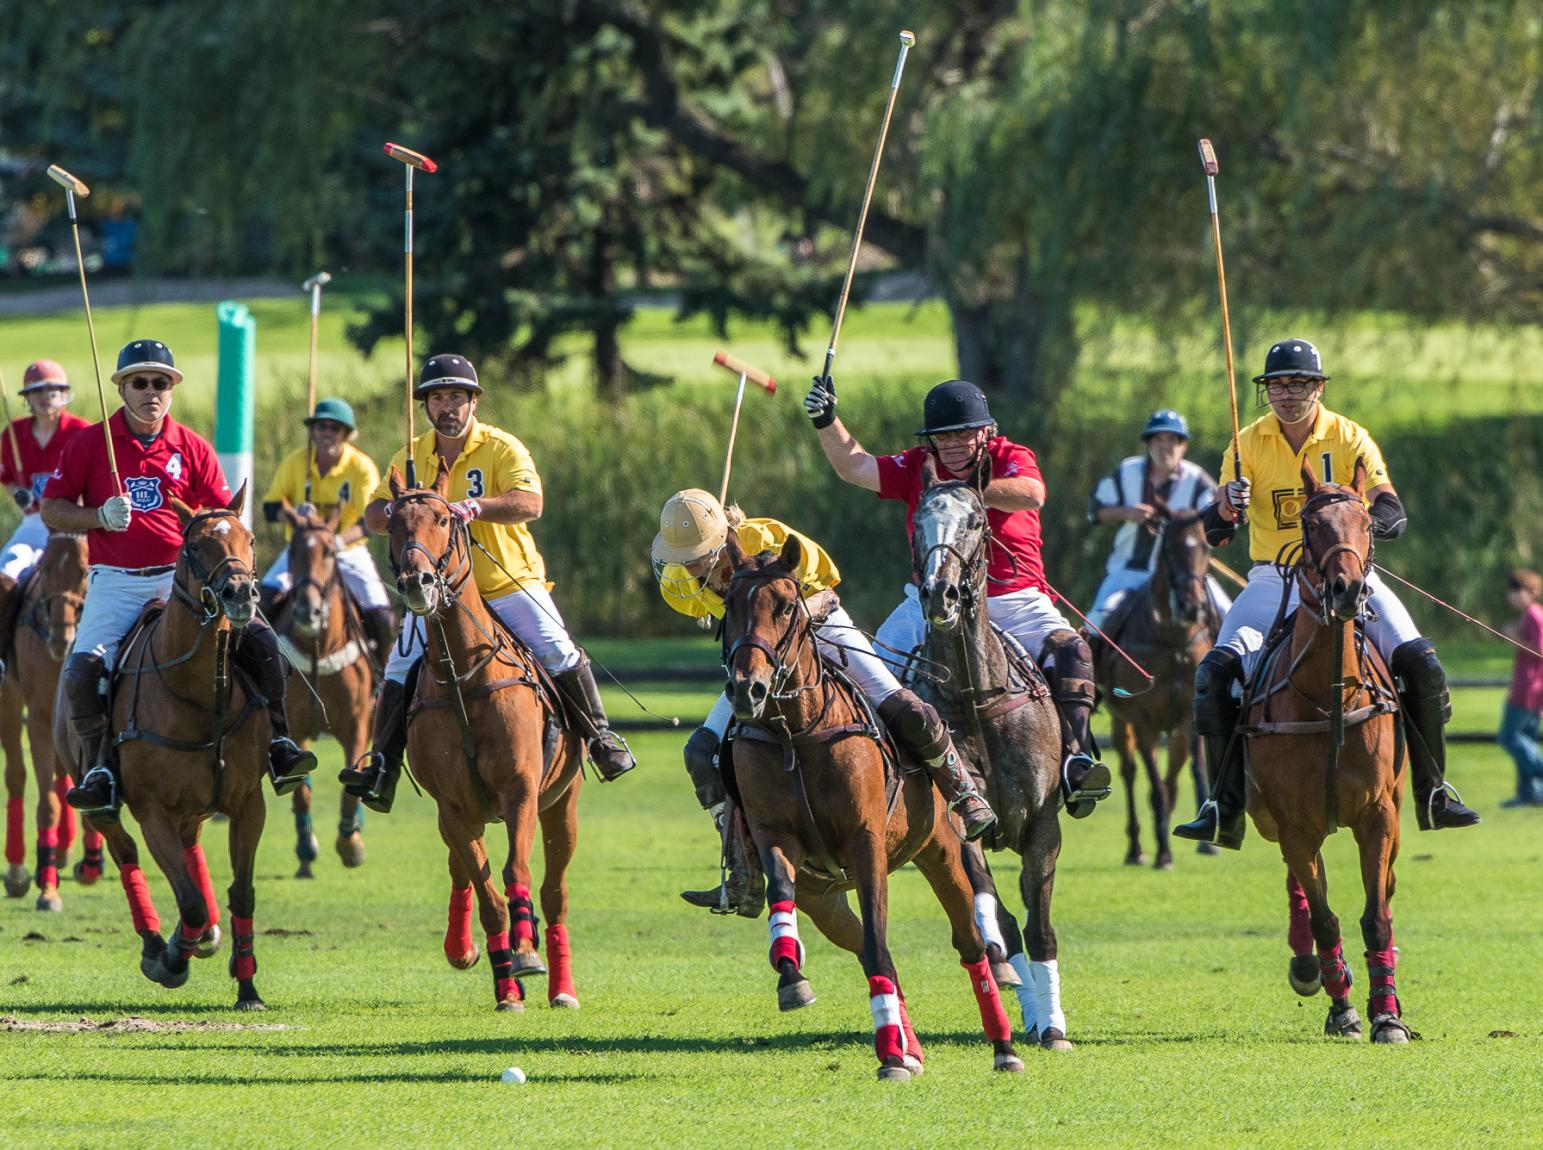 People on horseback playing Polo in Oak Brook